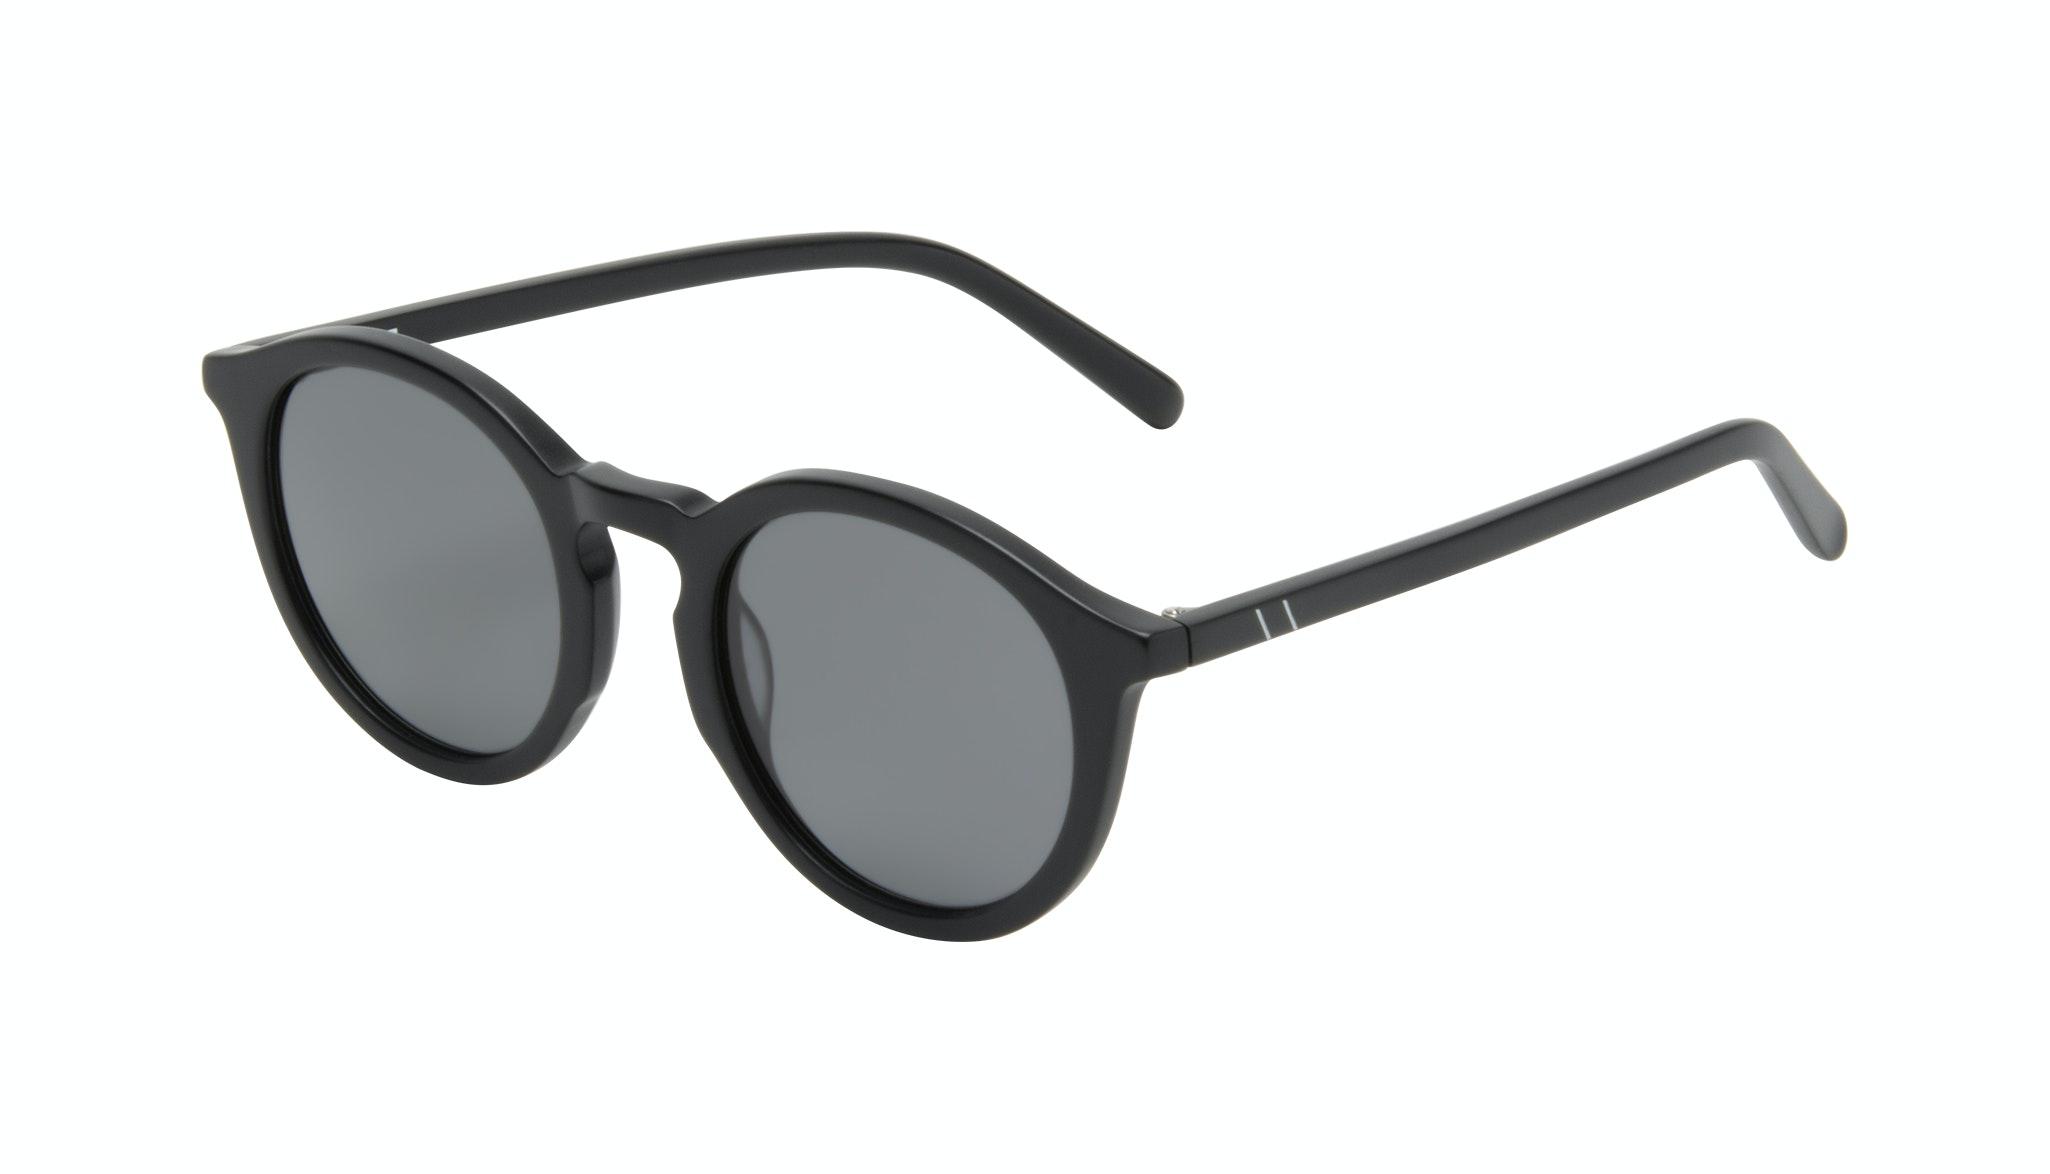 Affordable Fashion Glasses Round Sunglasses Men Thrill Onyx Matte Tilt